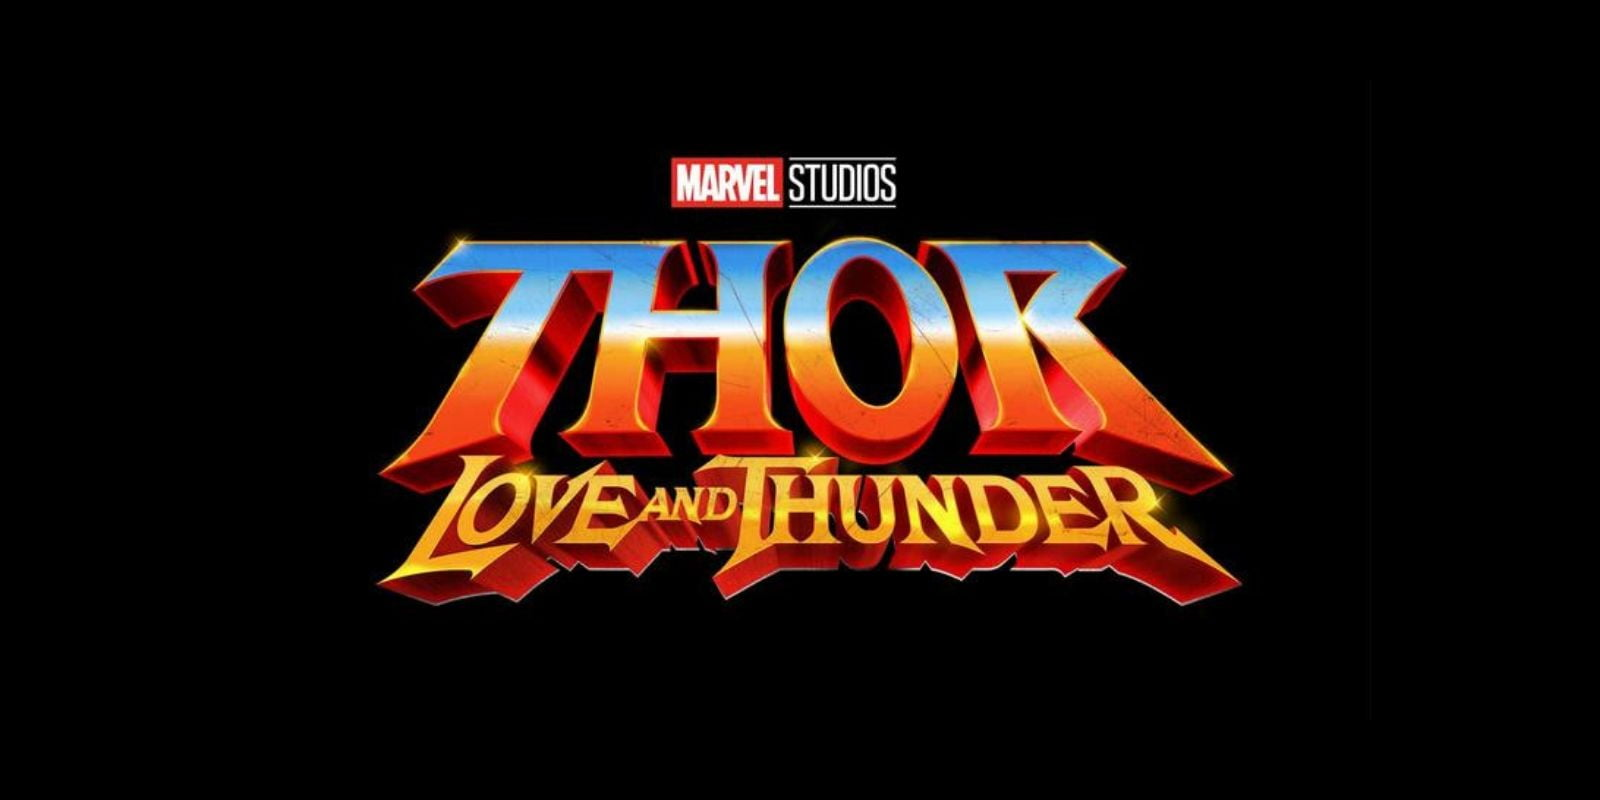 Thor: Love And Thunder movie logo from Marvel Phase 4